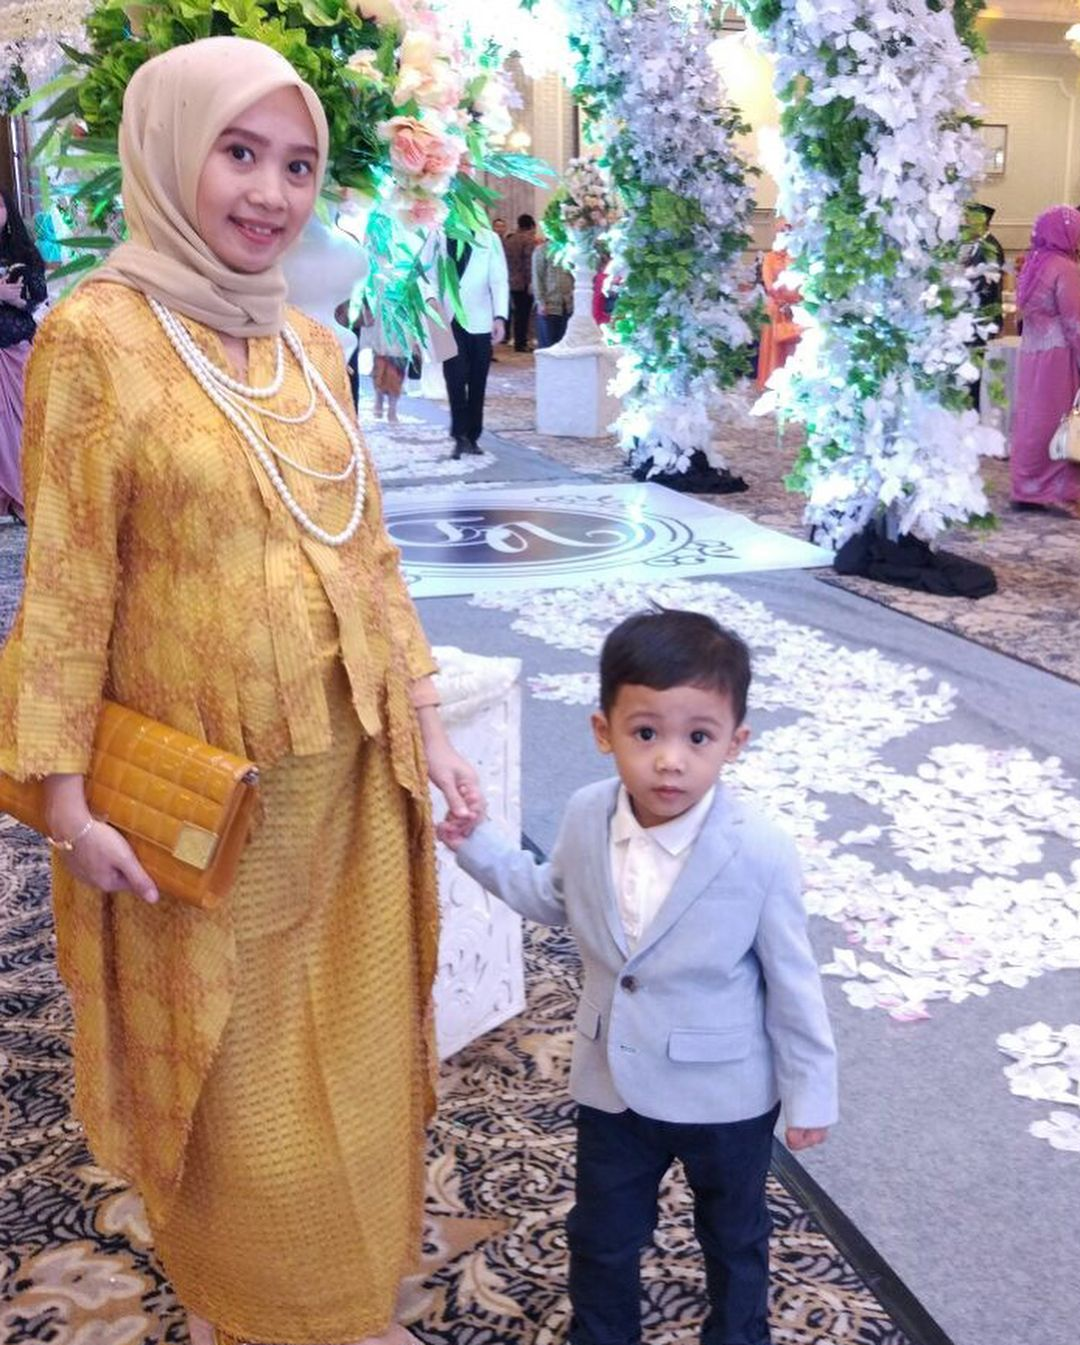 Model Baju Kebaya Ibu Hamil Modern - 8 Inspirasi Kebaya ...